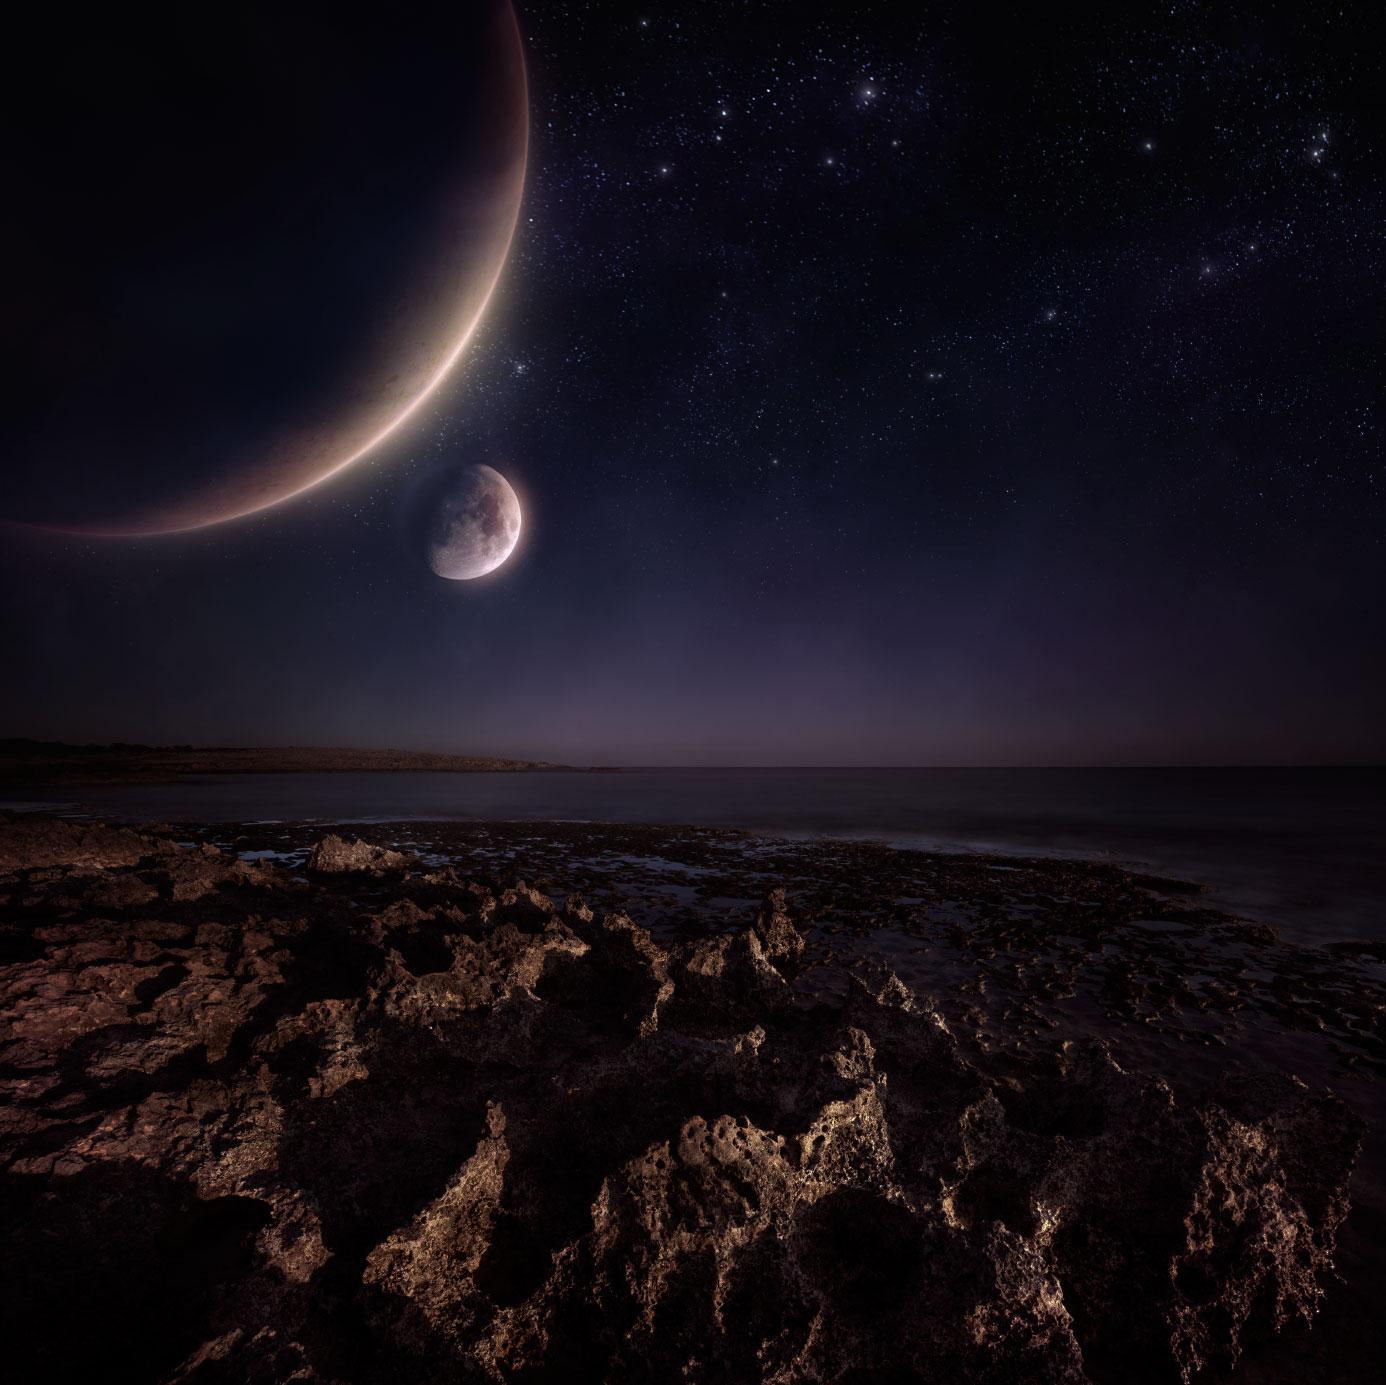 Galactic Habitable Zones